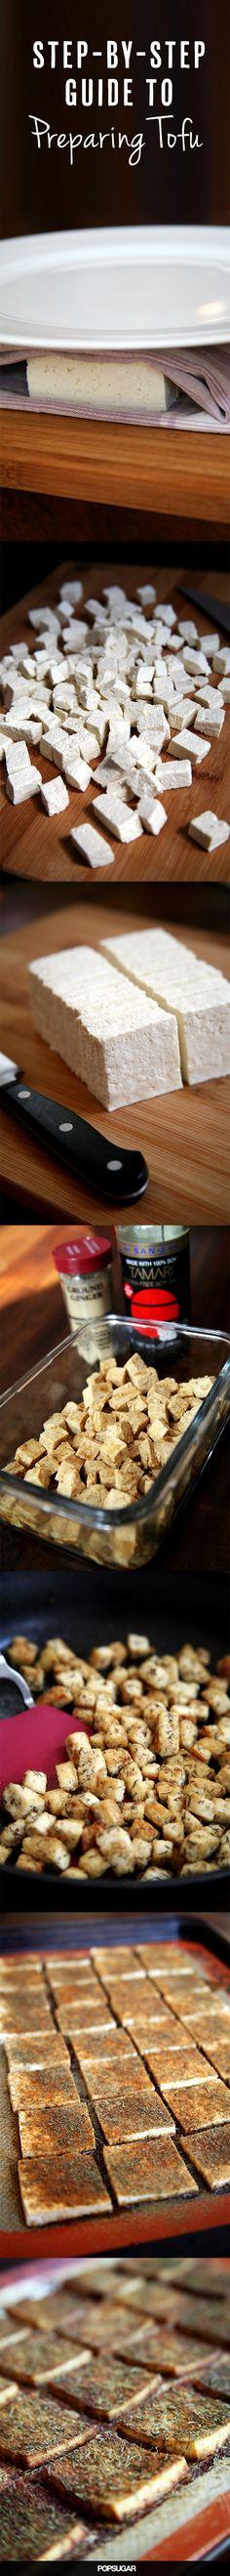 A Newbie's Guide to Preparing Tofu (That Even Tofu-Haters Will Love!)